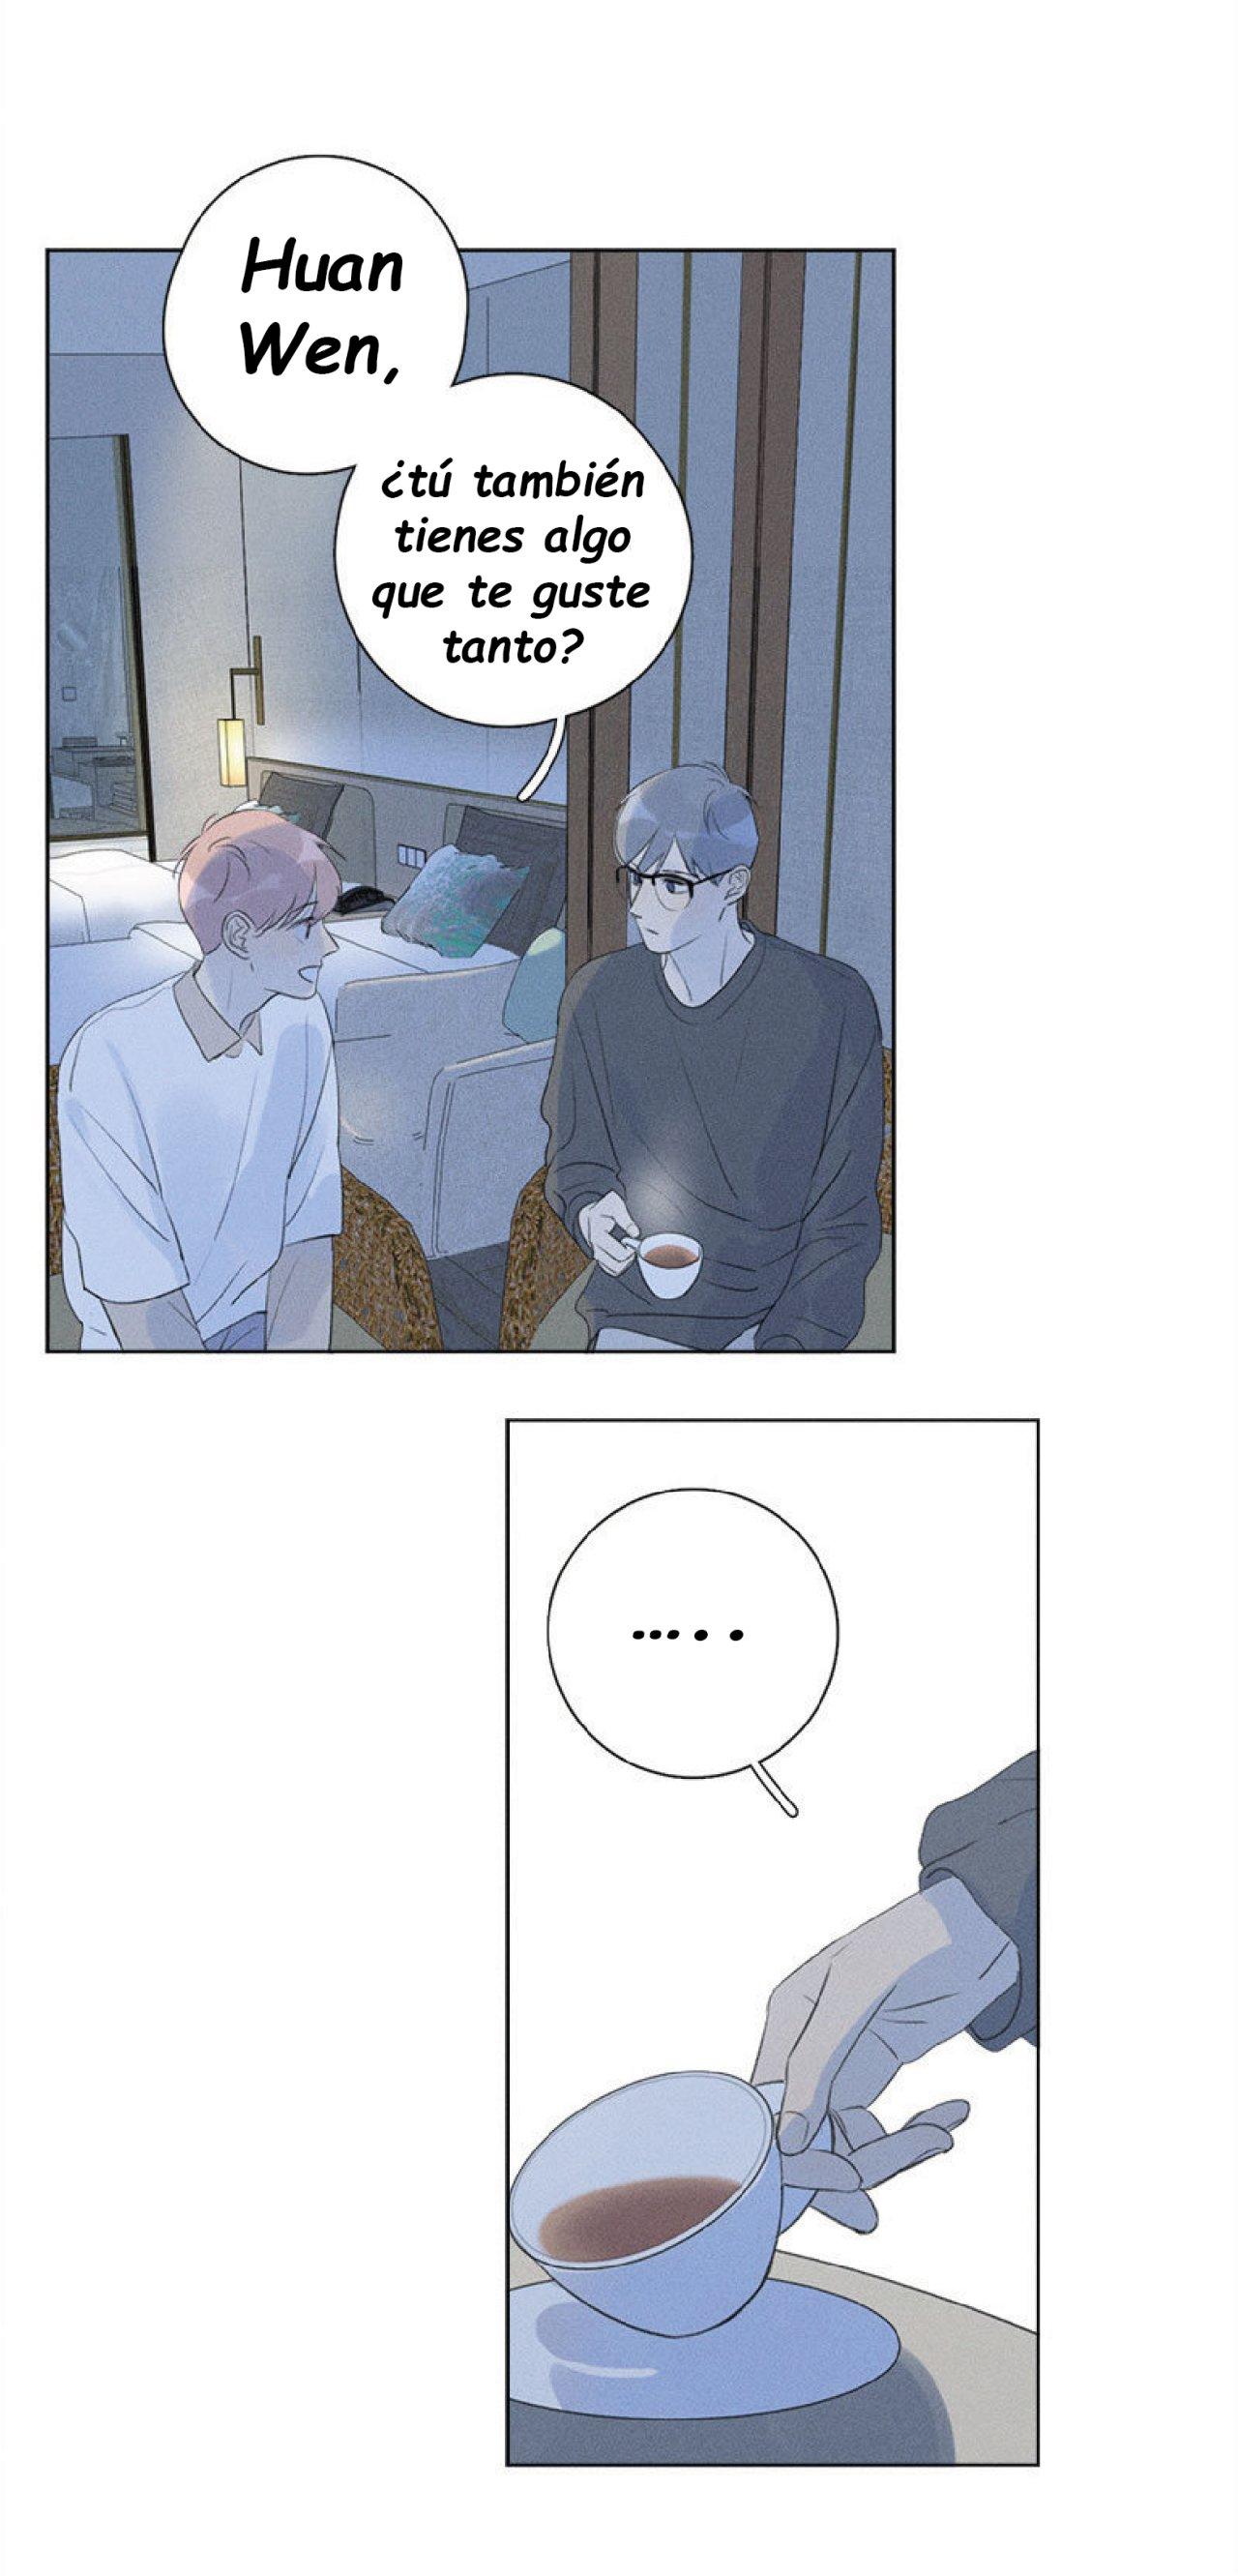 https://nine.mangadogs.com/es_manga/pic8/29/24925/957375/01671d8272924e3d10bce2c73066e933.jpg Page 31